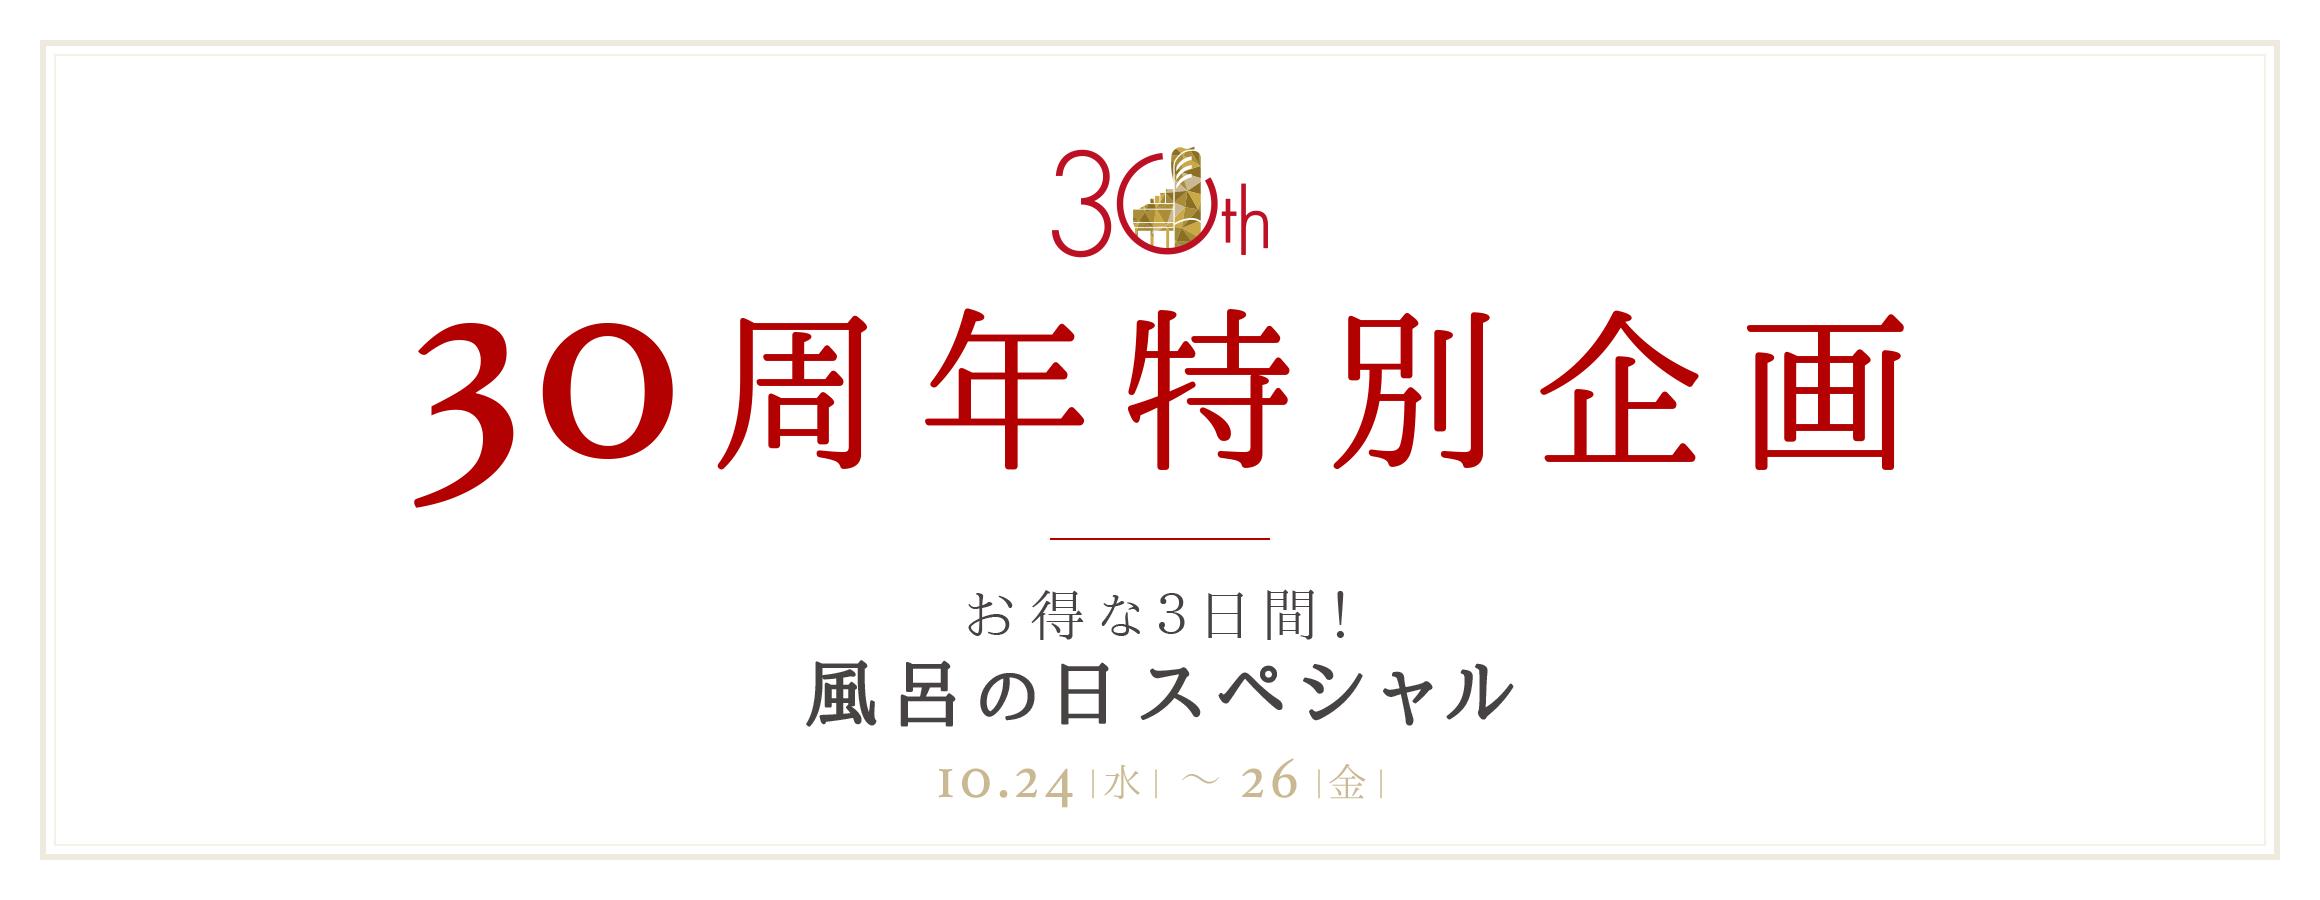 JASMAC PLAZA 毎月26日は風呂の日 風呂の日 開業30周年 風呂の日スペシャル 3DAYS - 10/24~26 -